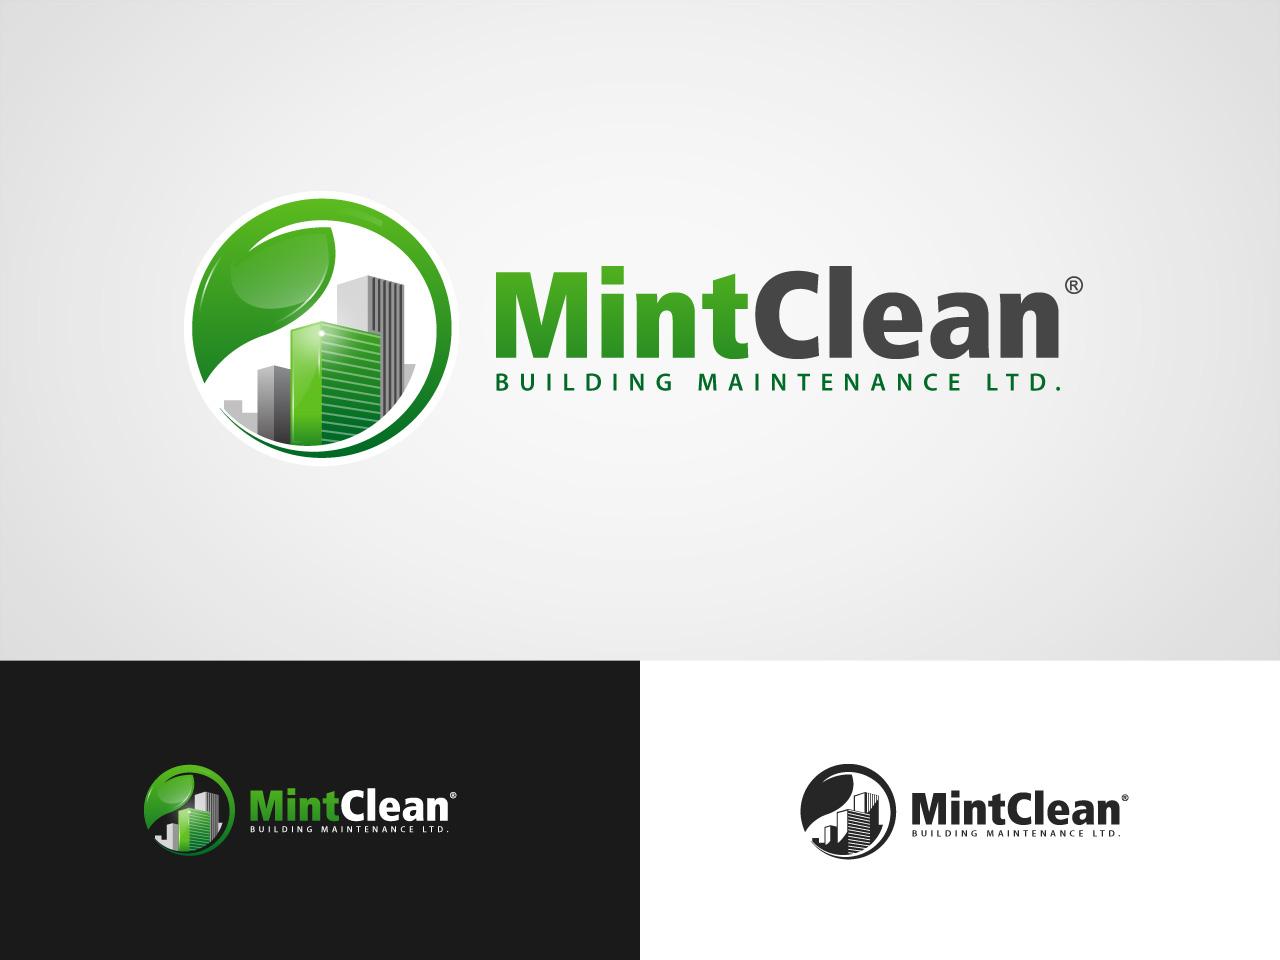 Logo Design by jpbituin - Entry No. 153 in the Logo Design Contest MintClean Building Maintenance Ltd. Logo Design.